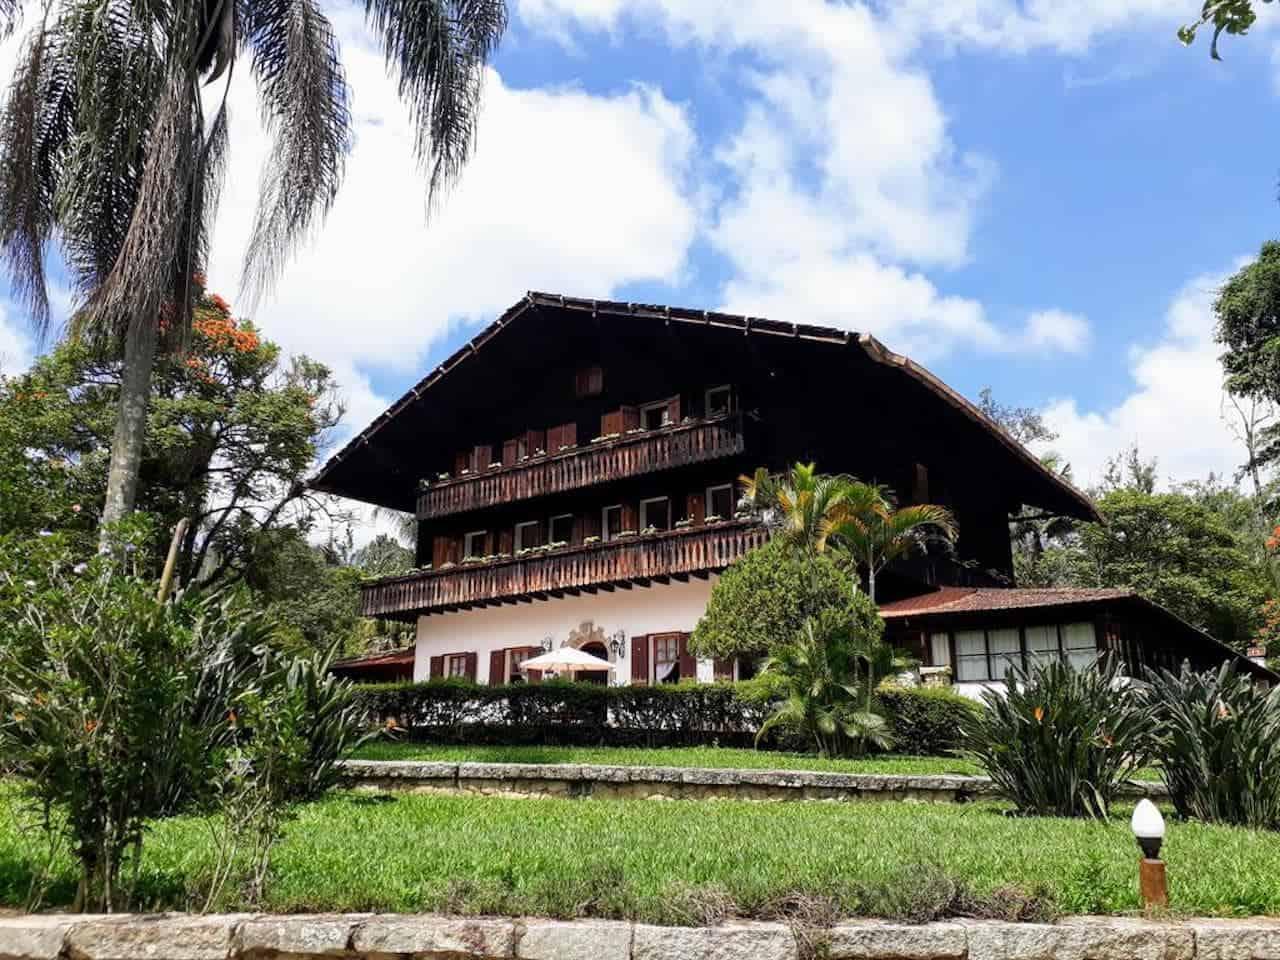 Hotel Fazenda Sao Moritz